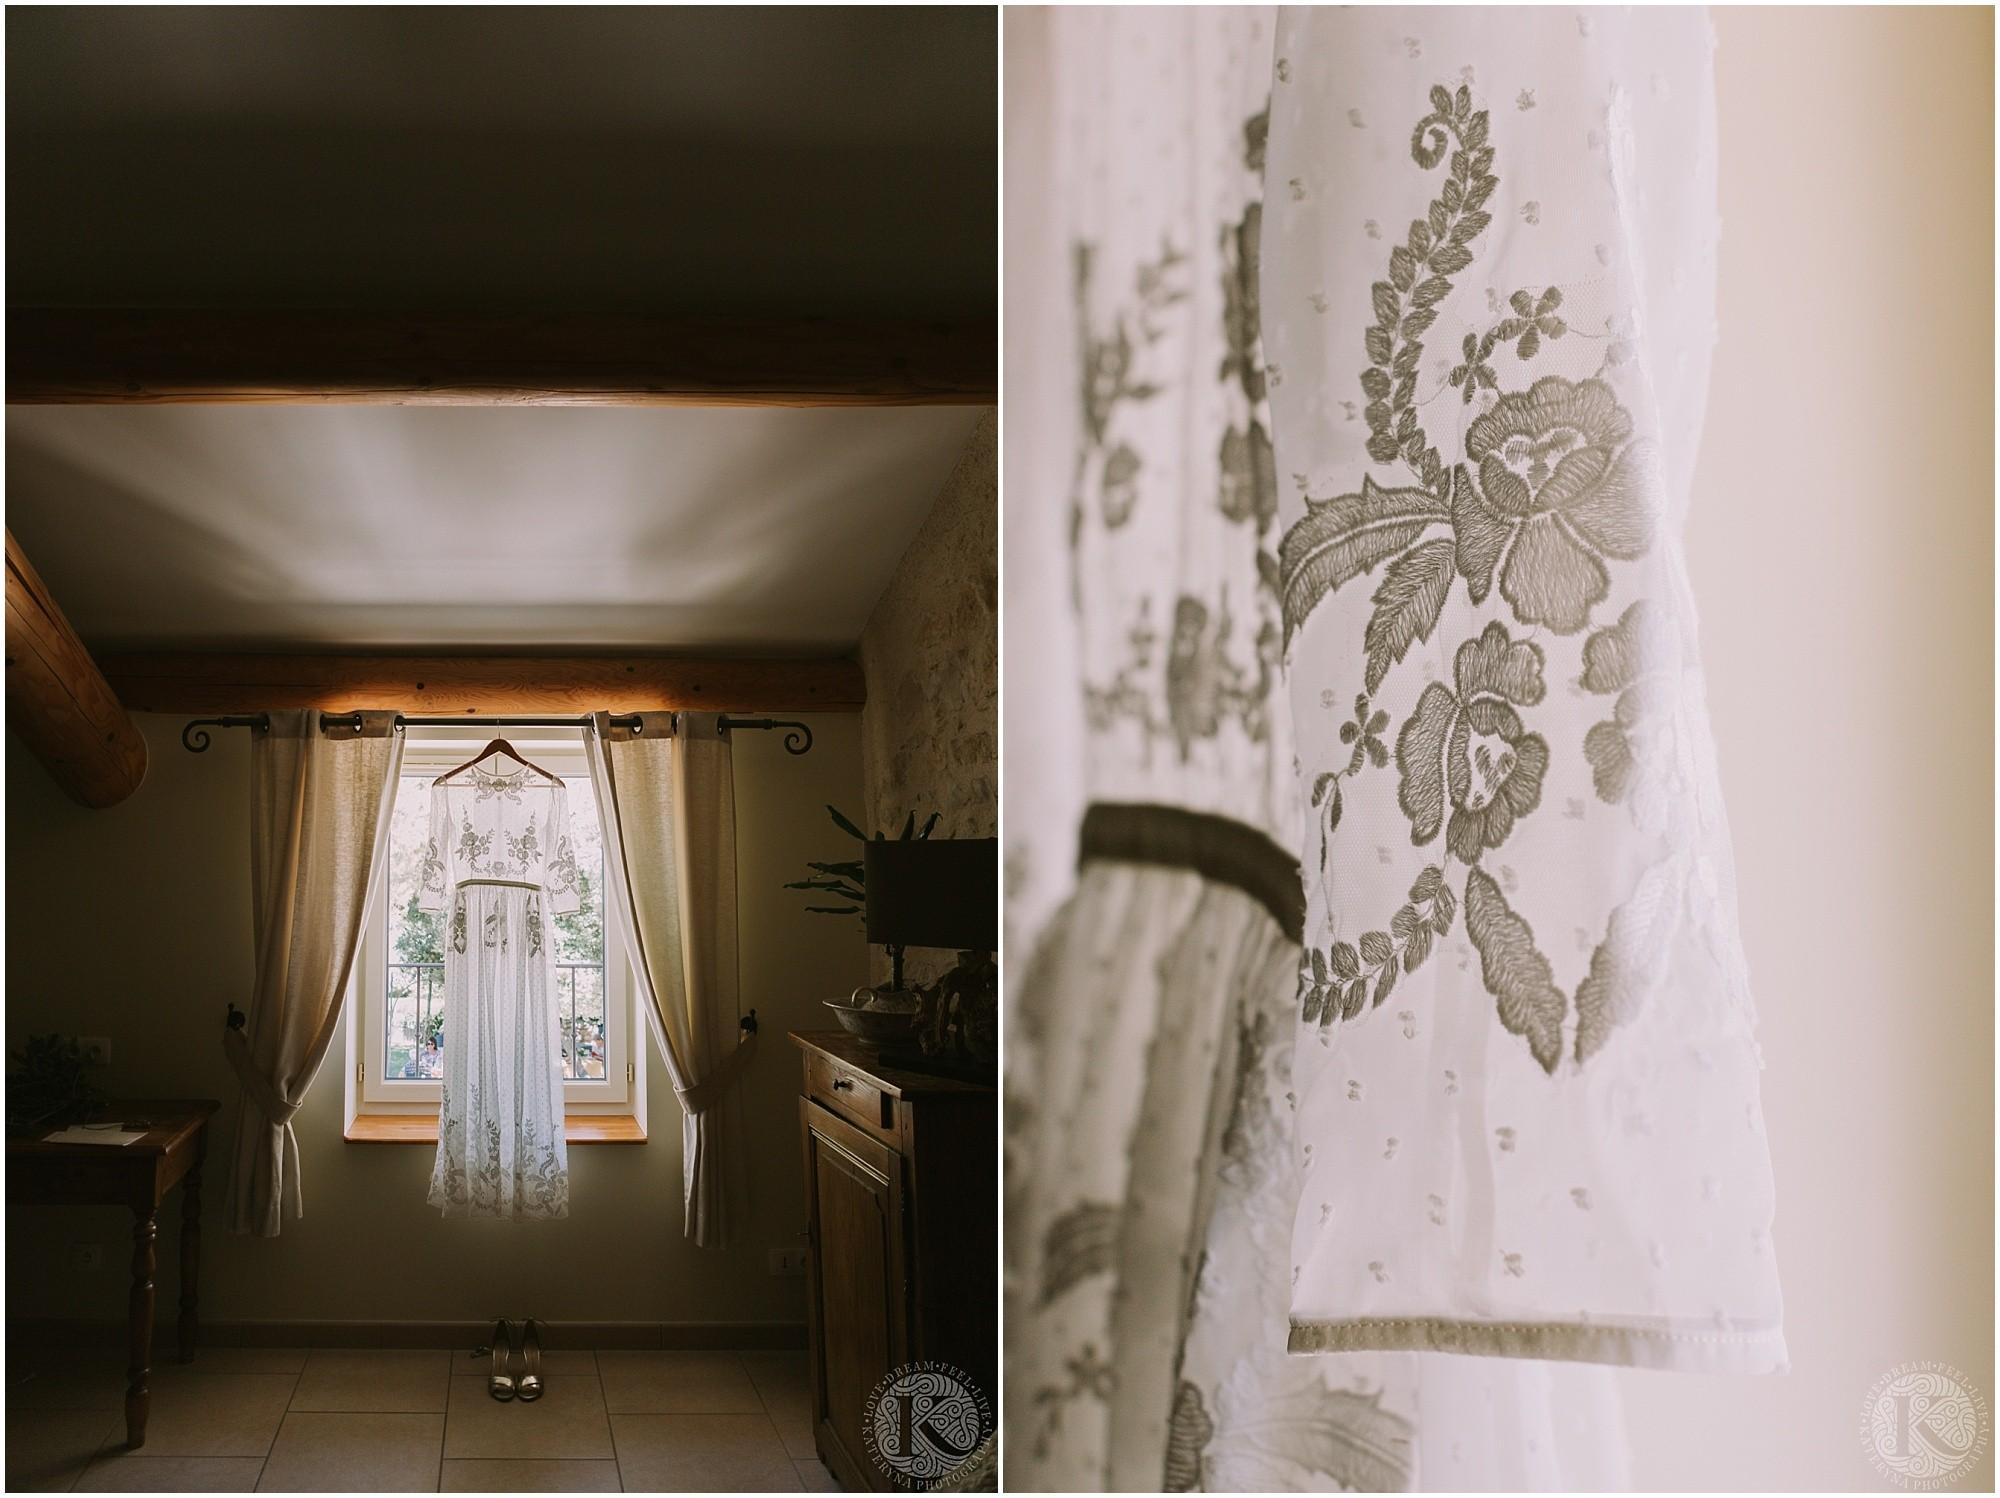 Kateryna-photos-photographe-mariage-vaucluse-provence-avignon-ferme-st-hugues_0011.jpg